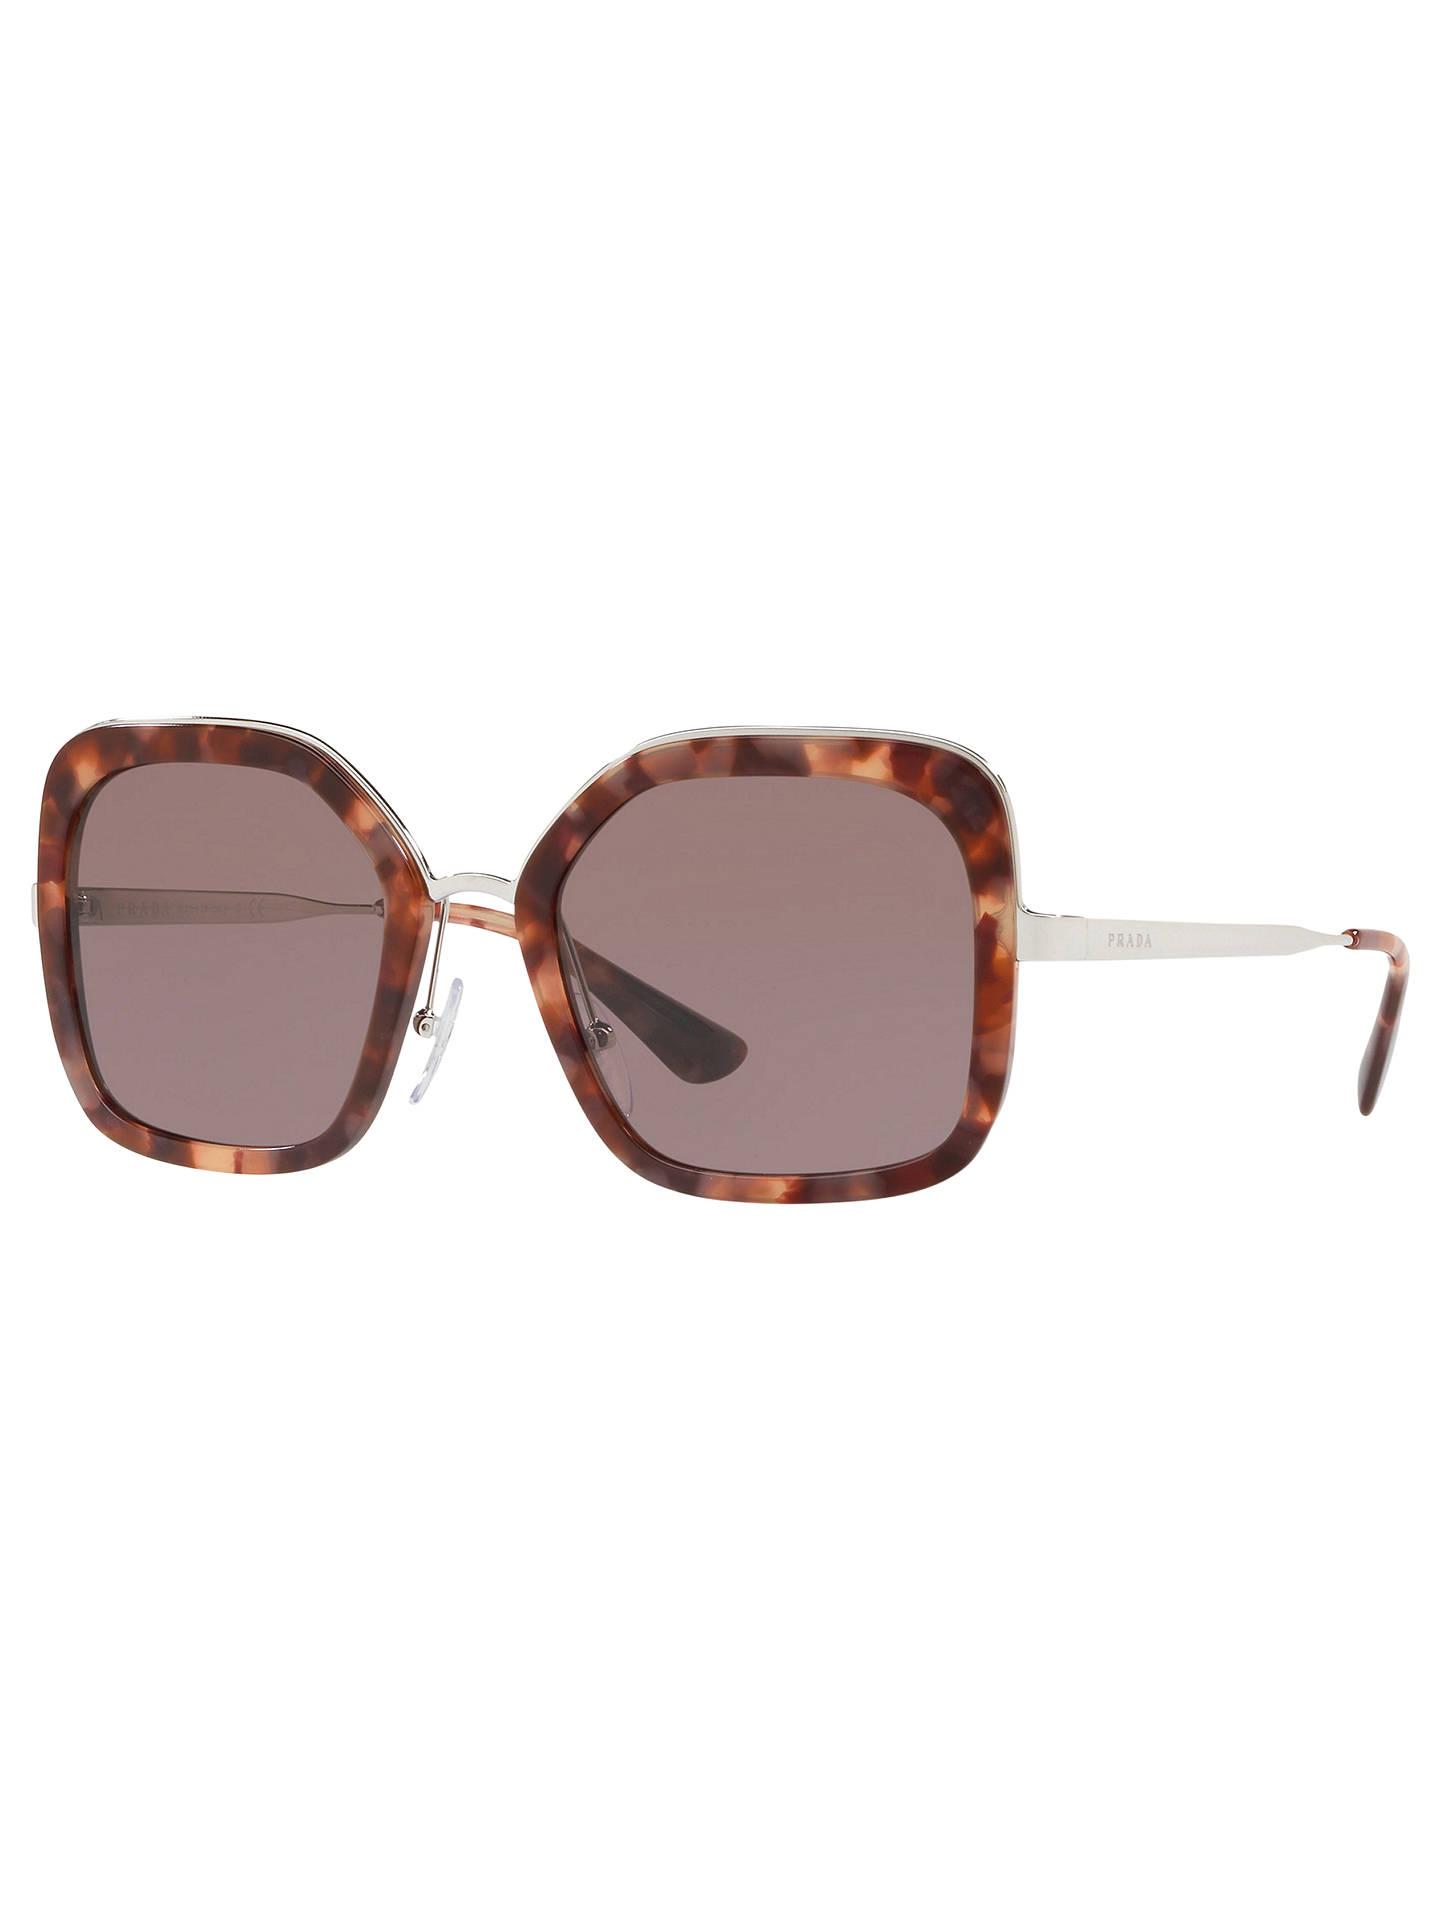 2164ed92438 BuyPrada 57US Women s Square Sunglasses